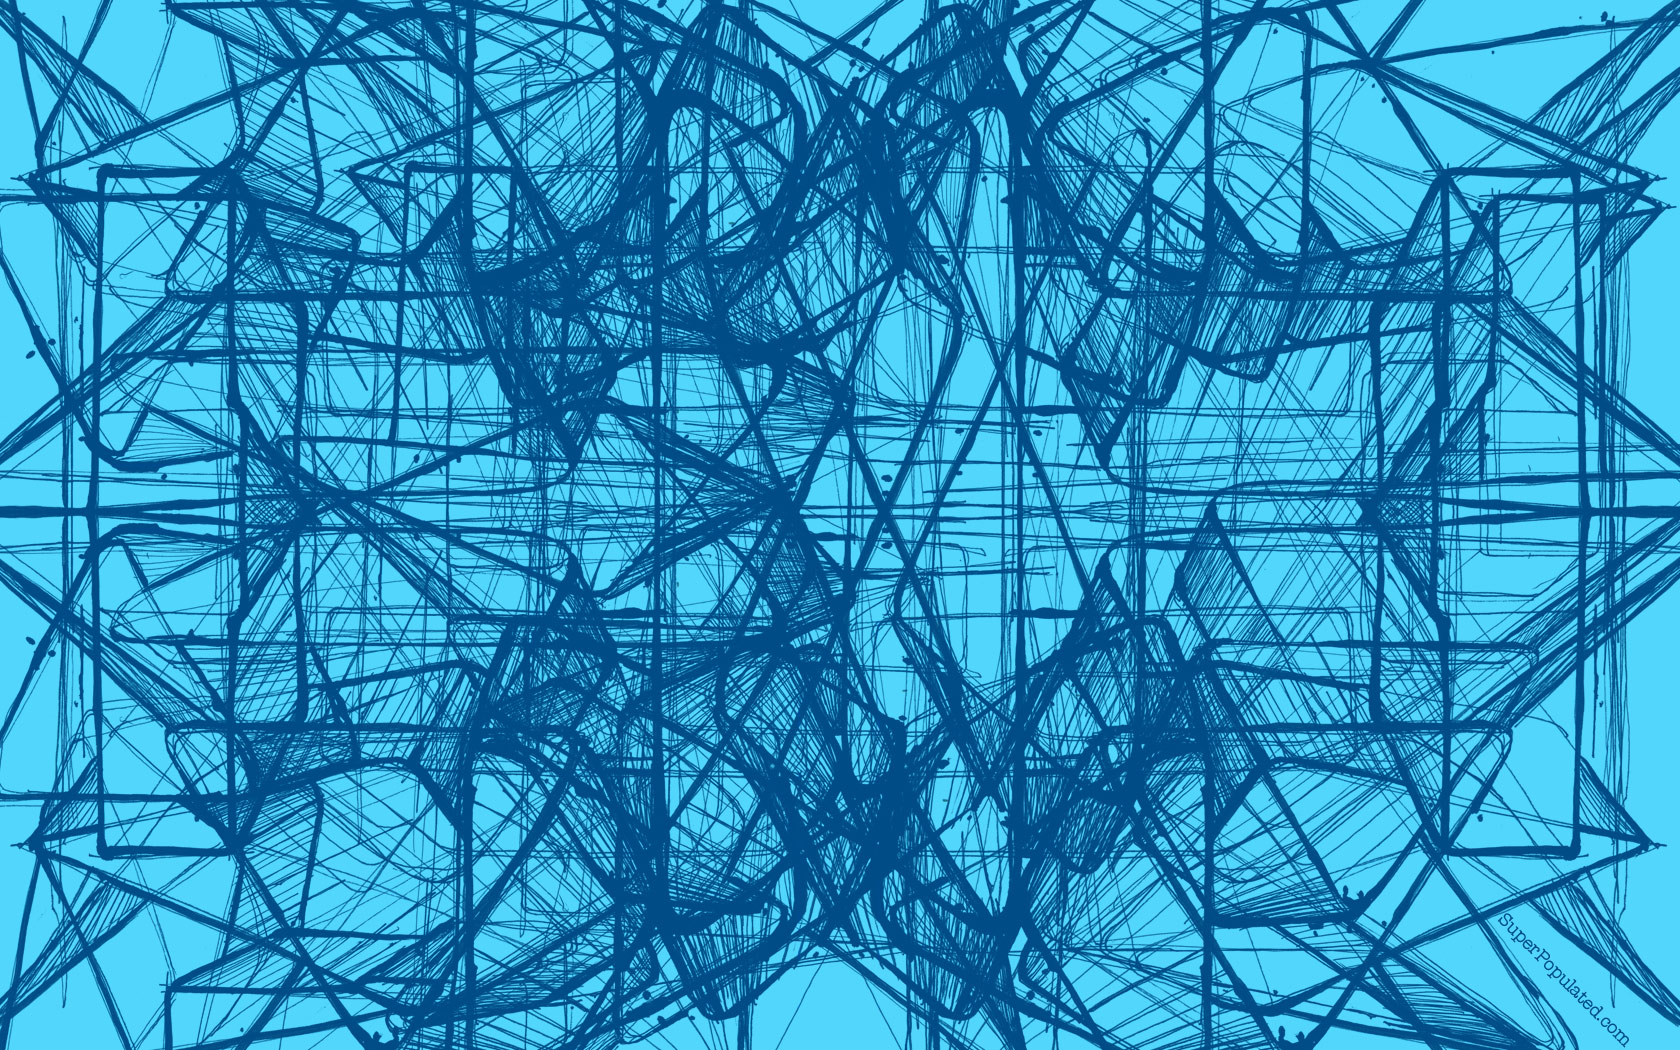 geometric hd wallpaper widescreen 1920x1080 - photo #39